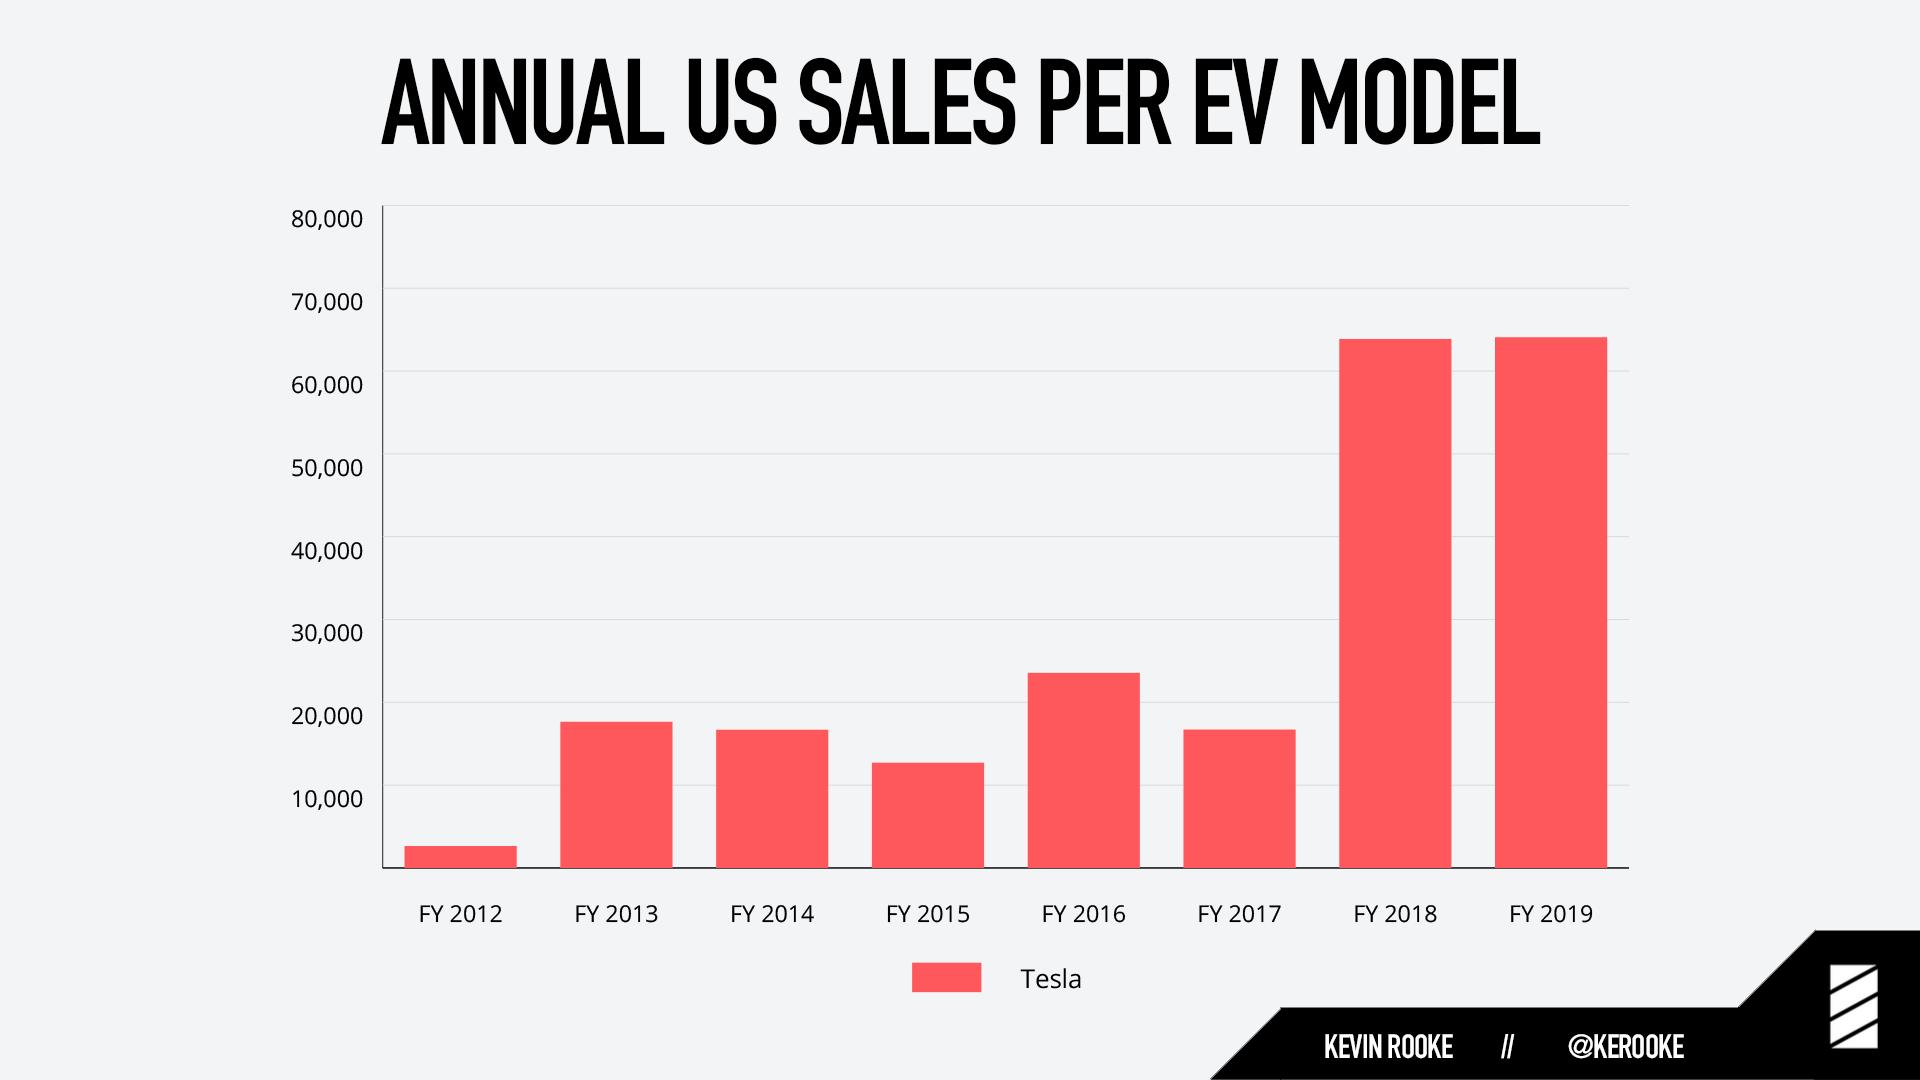 Annual US EV sales per Model Tesla